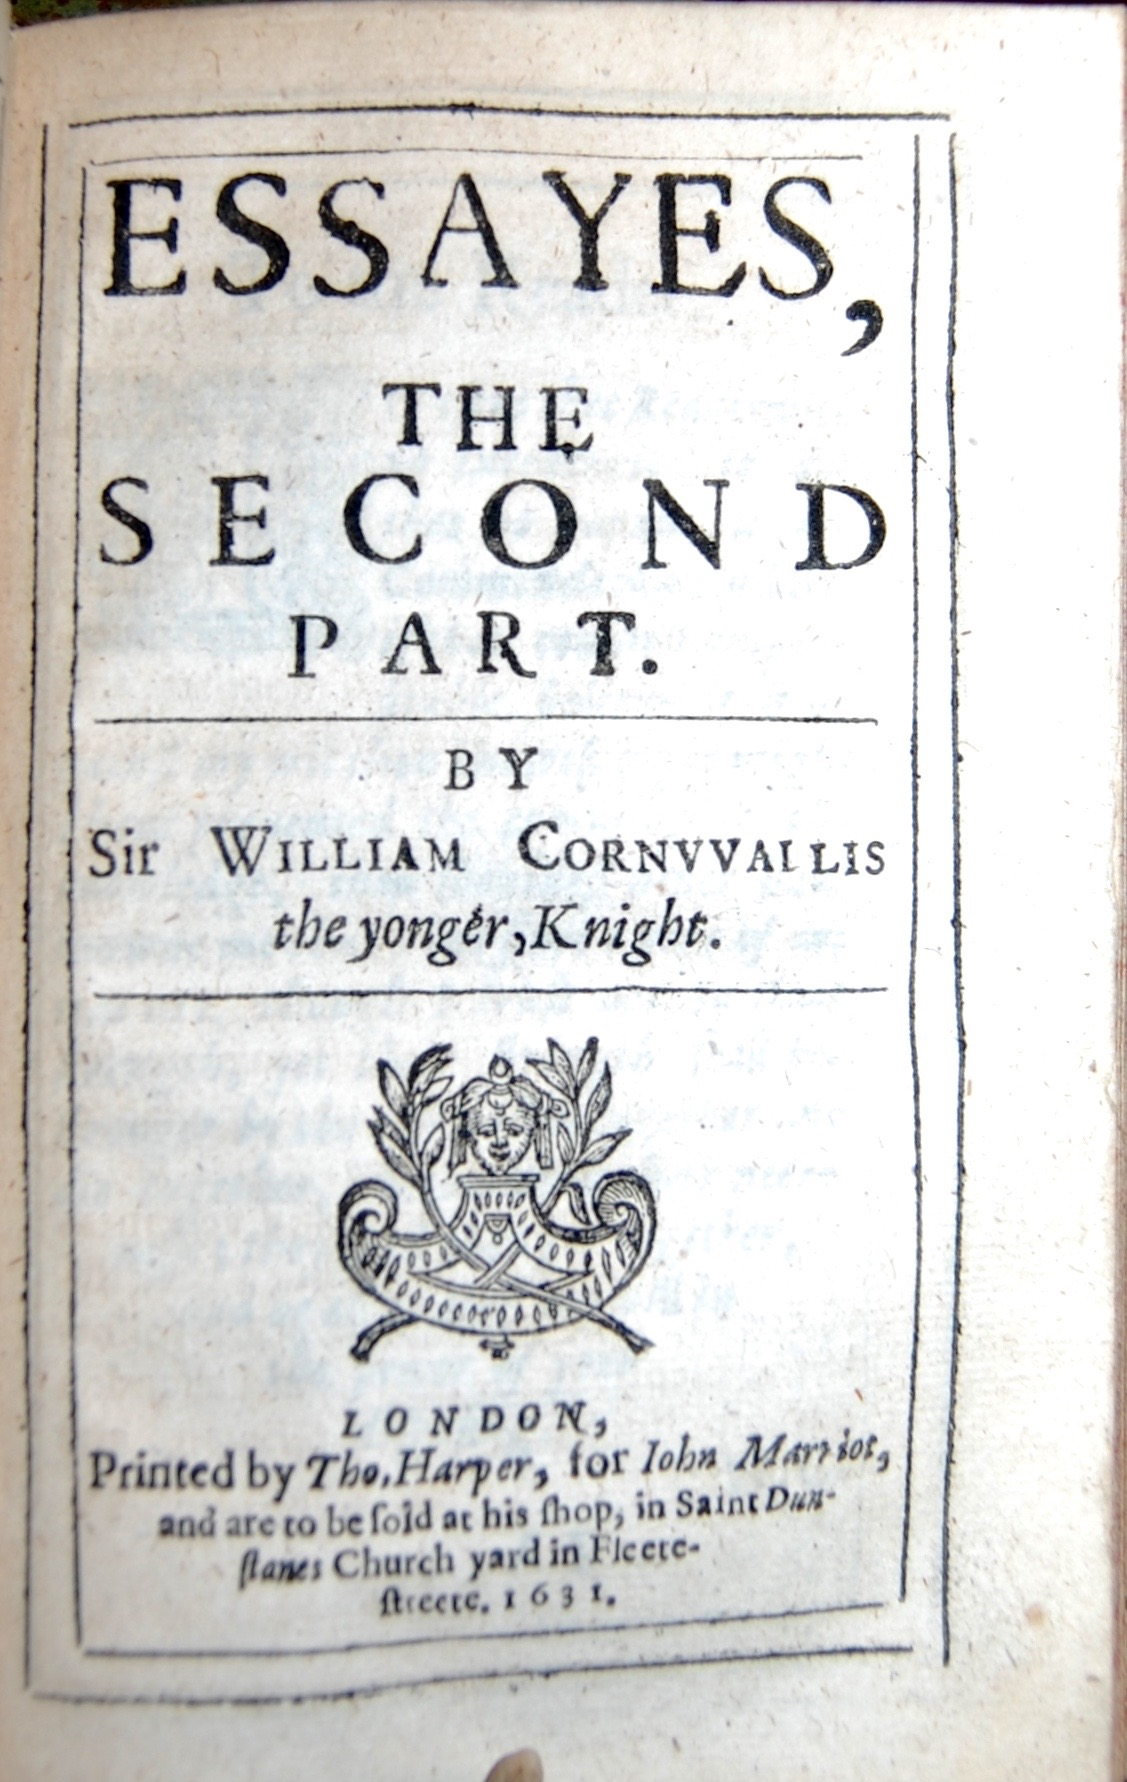 sir william cornwallis of brome